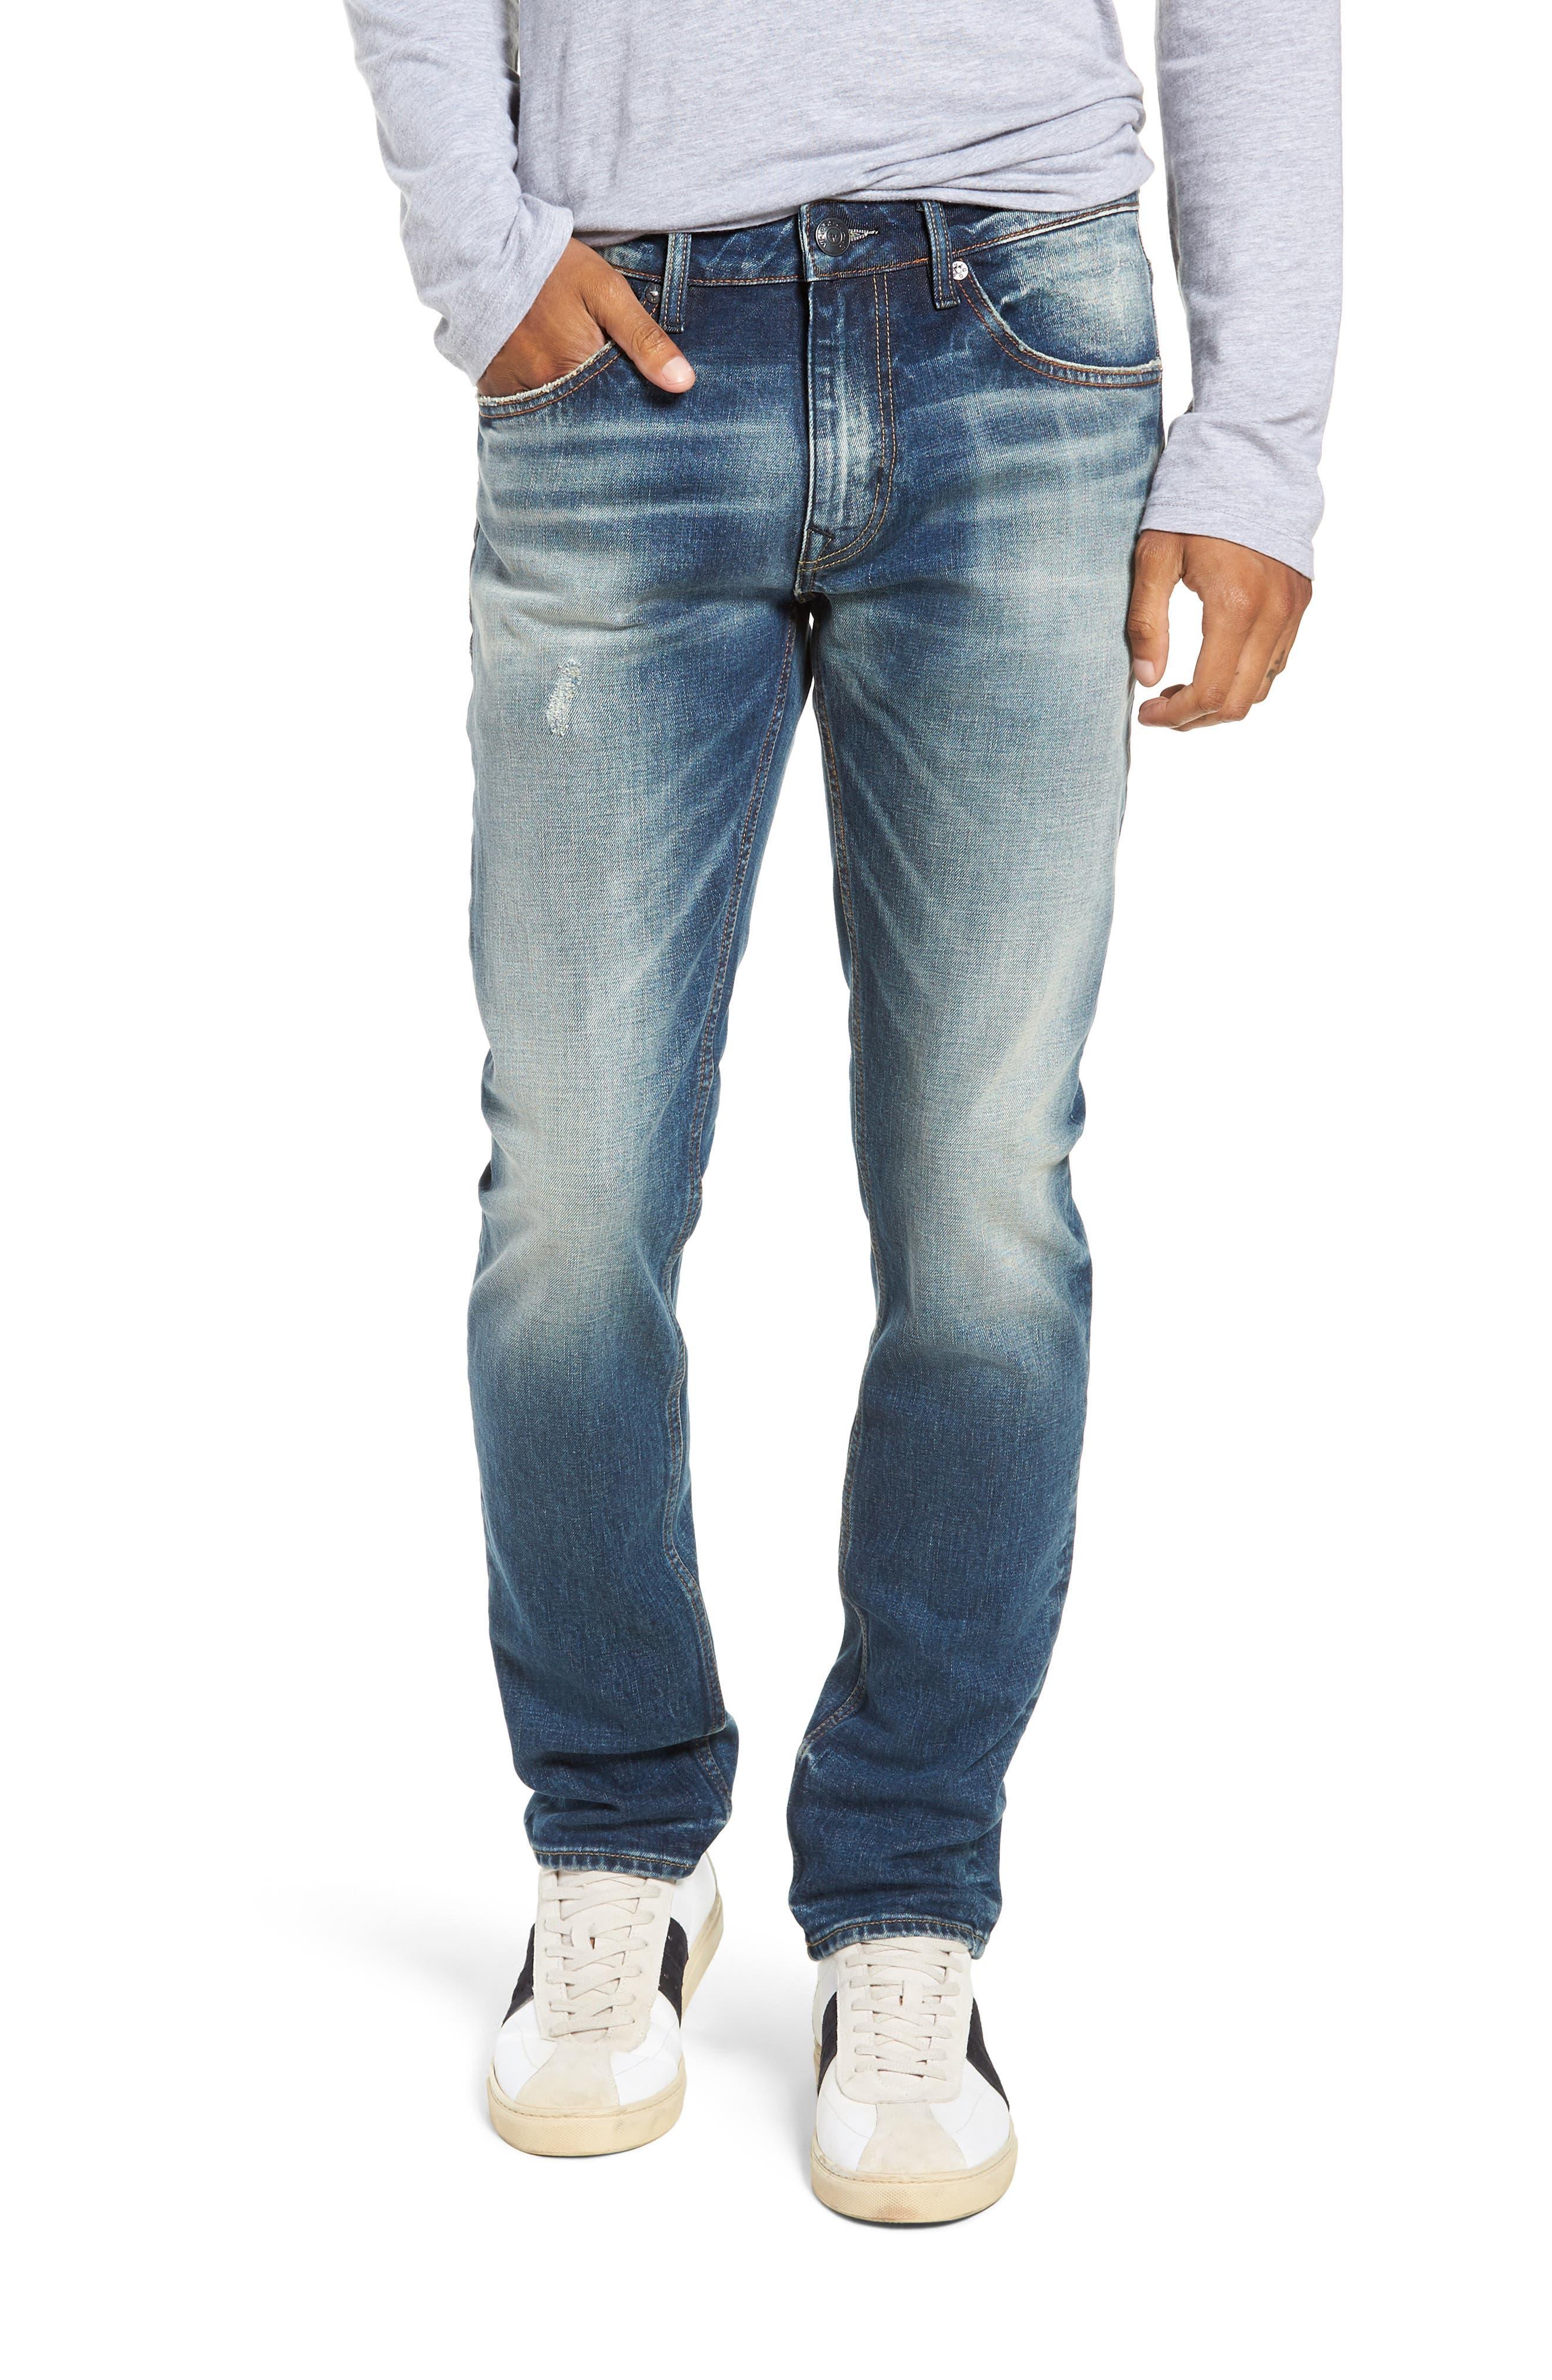 Mick Slim Fit Jeans,                         Main,                         color, VINTAGE WASH